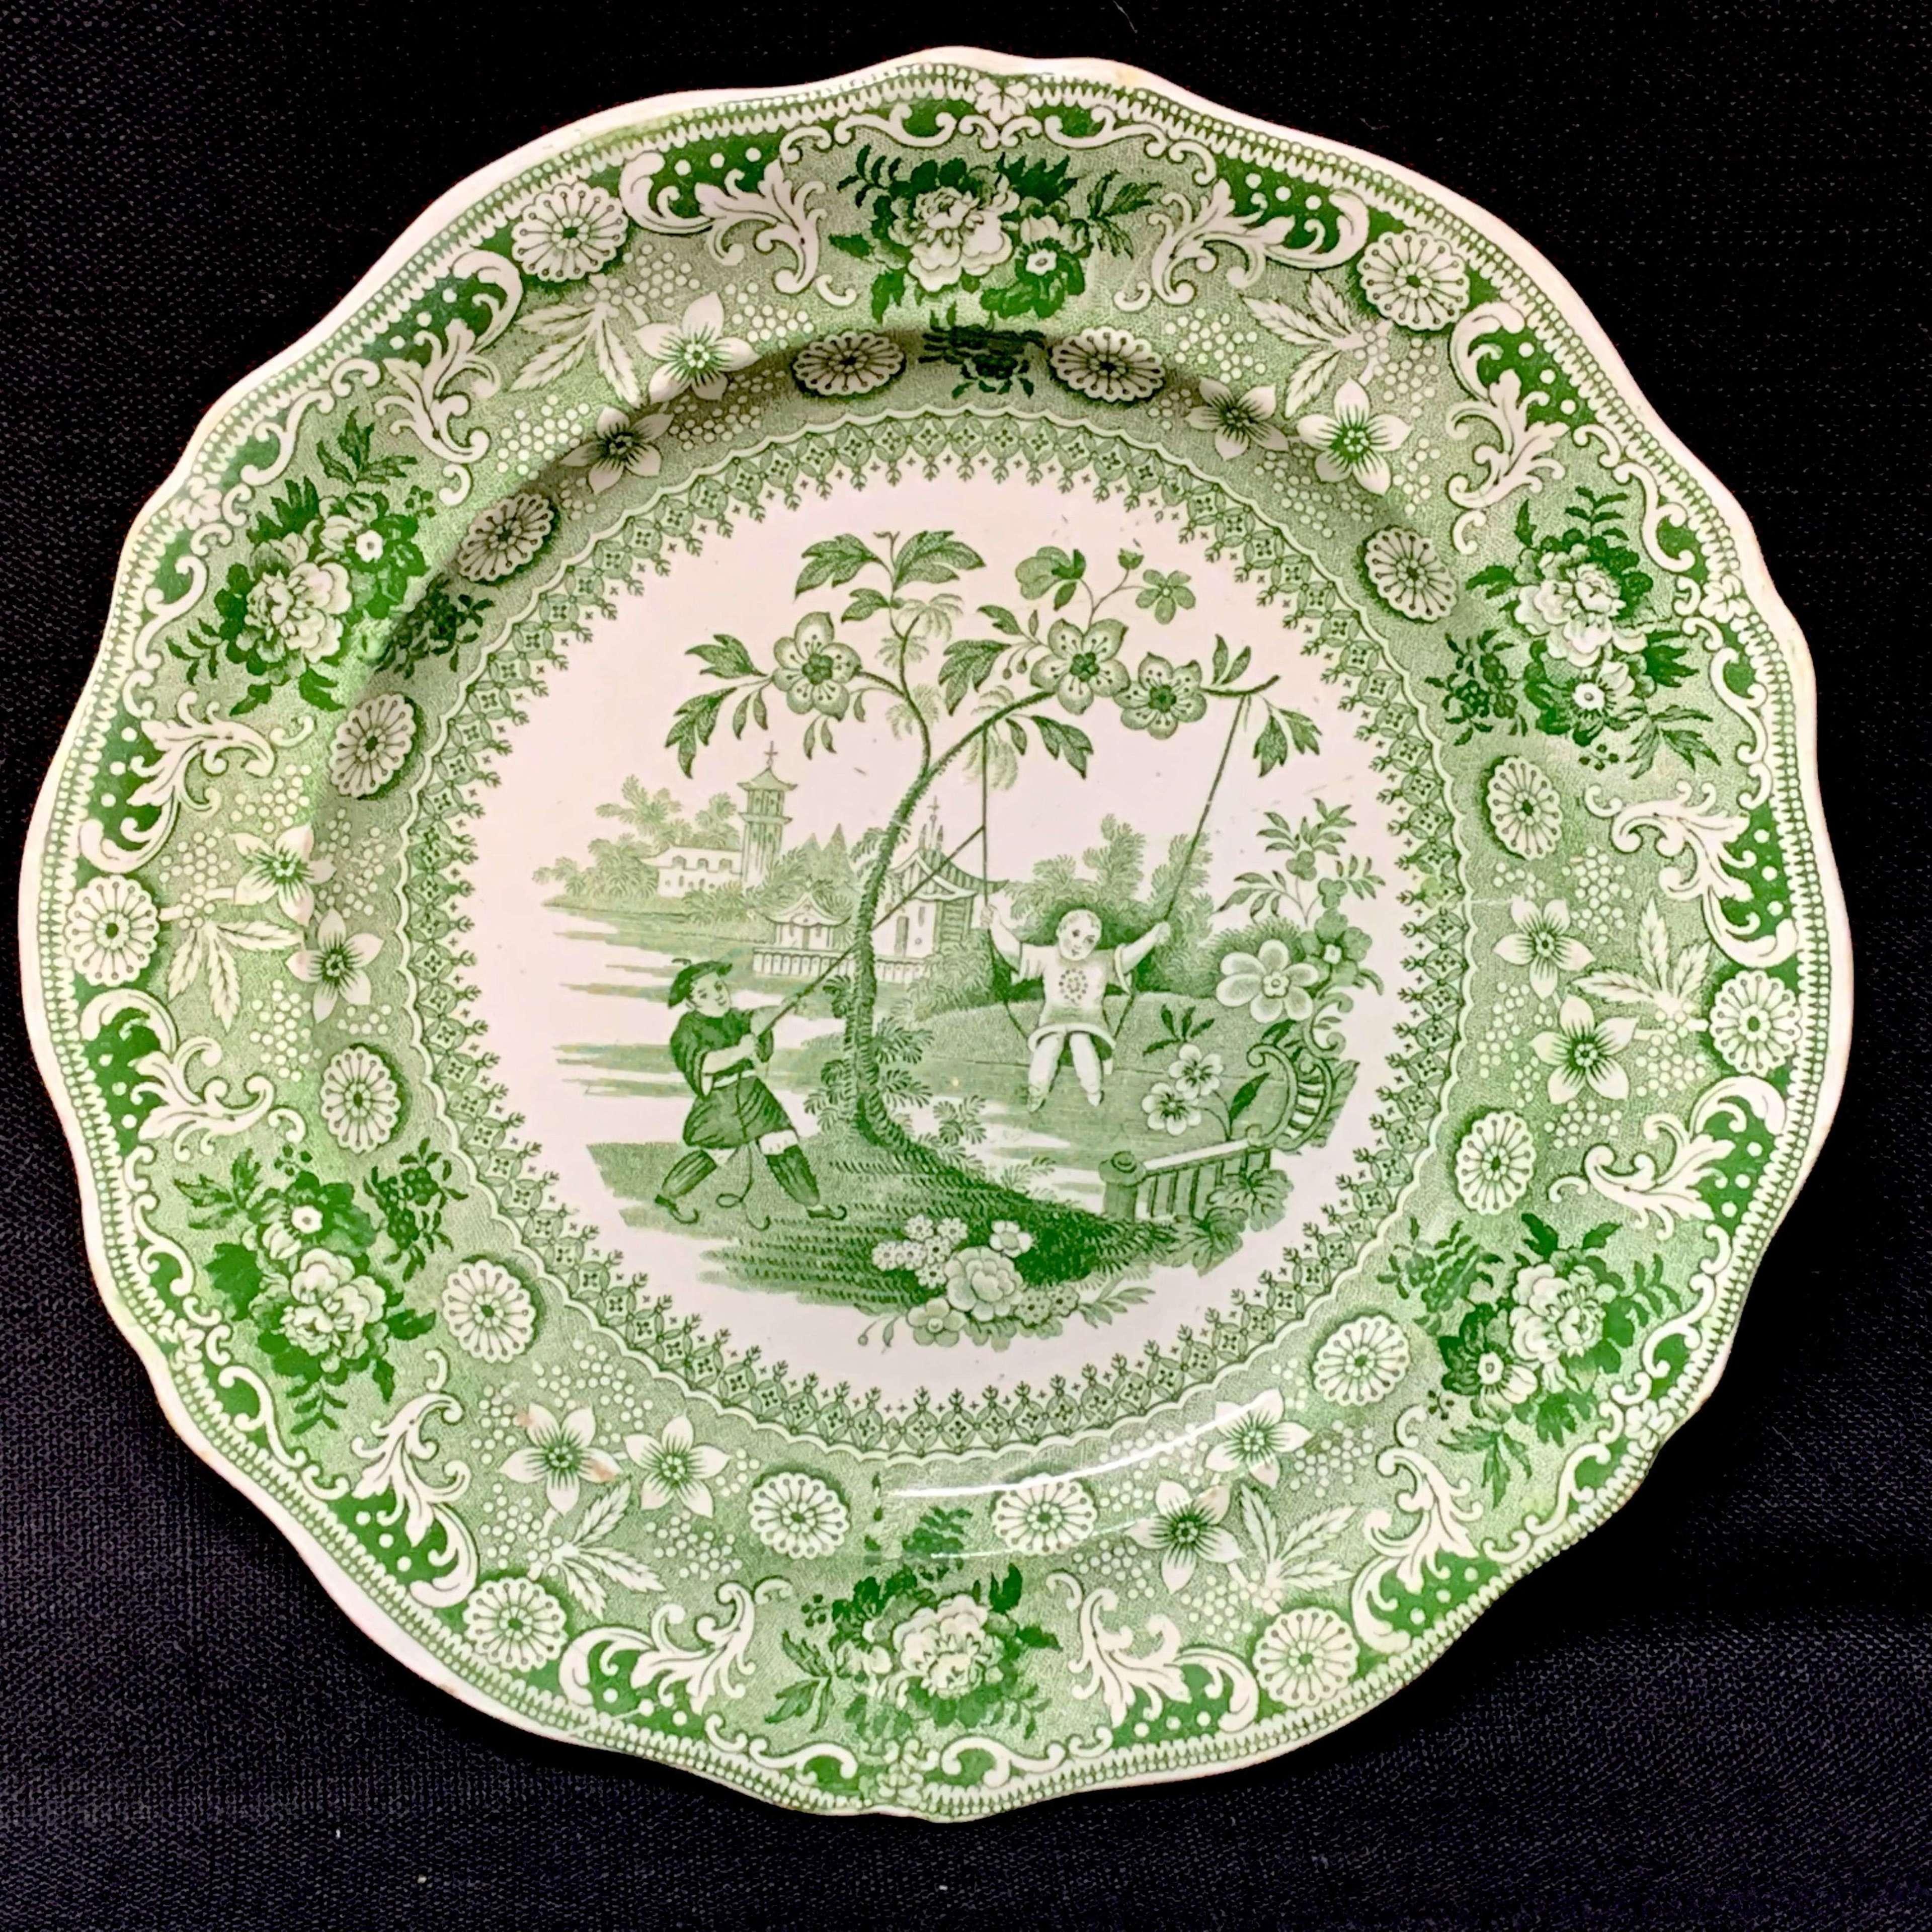 Davenport Staffordshire Green Transferware Plate Chinese Pastimes 1840